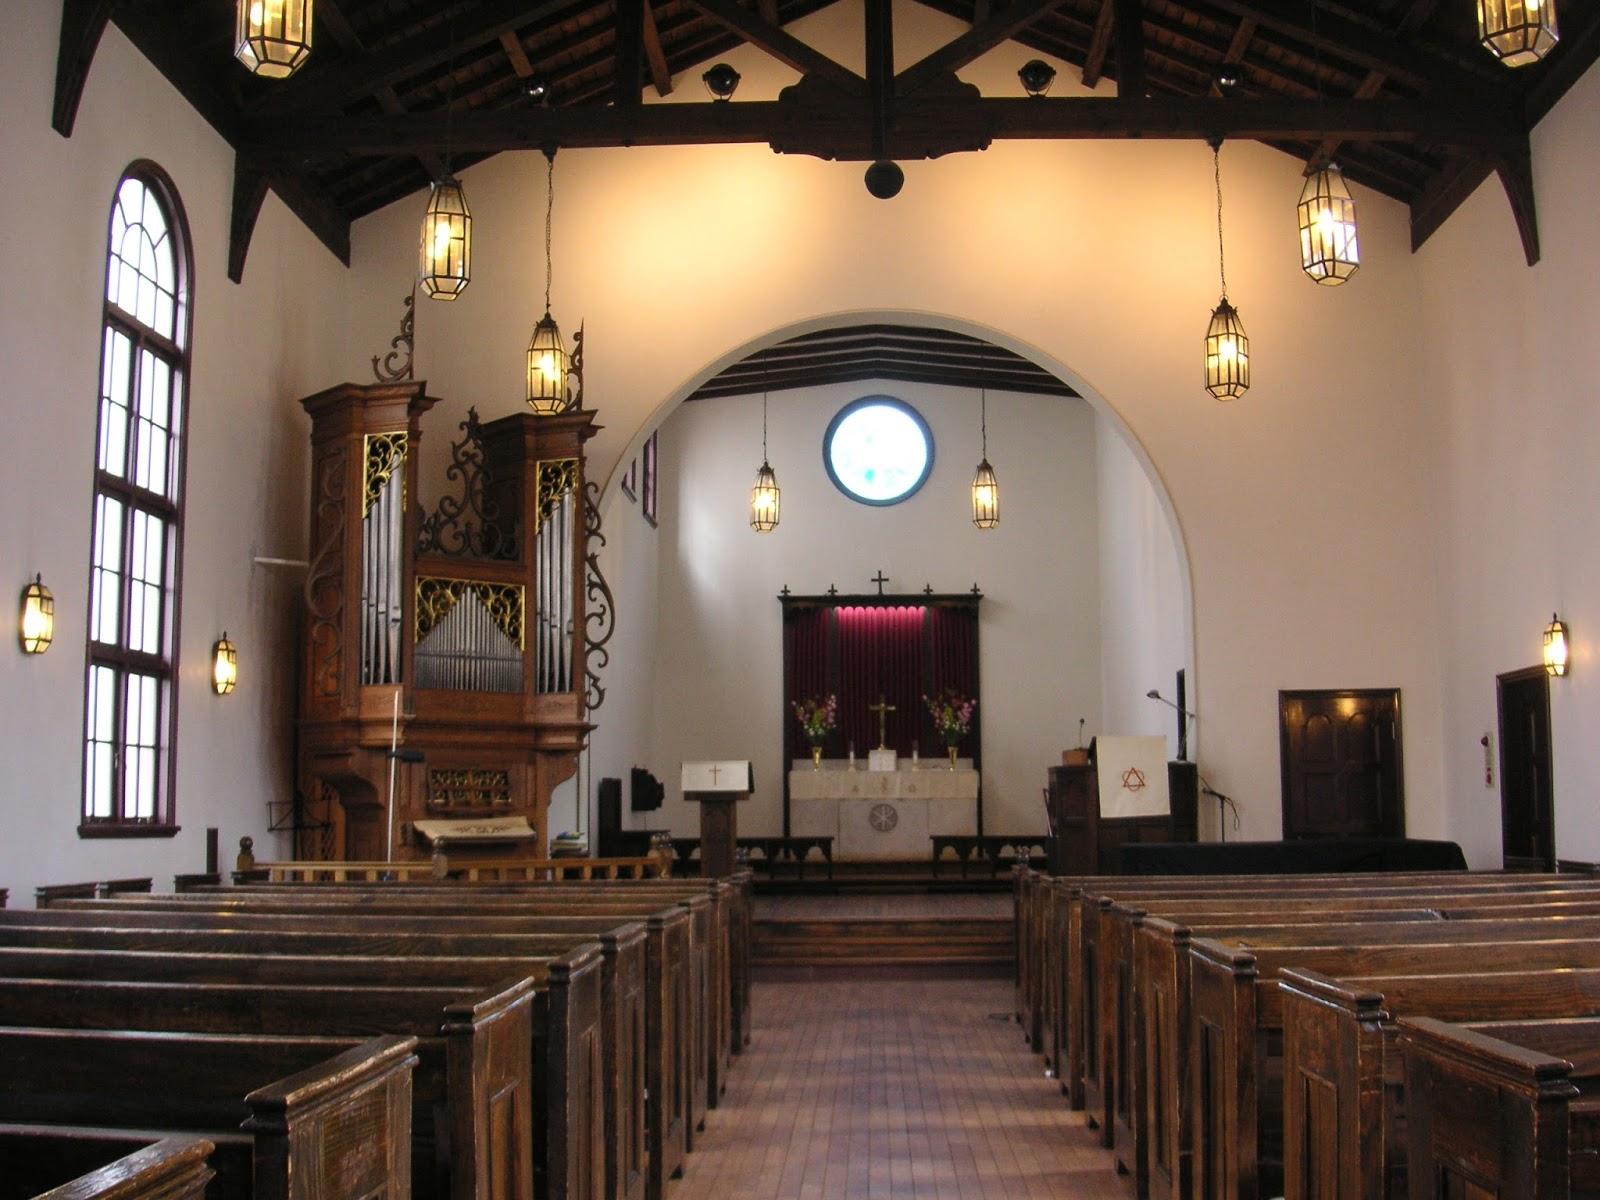 日本福音ルーテル博多教會: 會堂內の様子